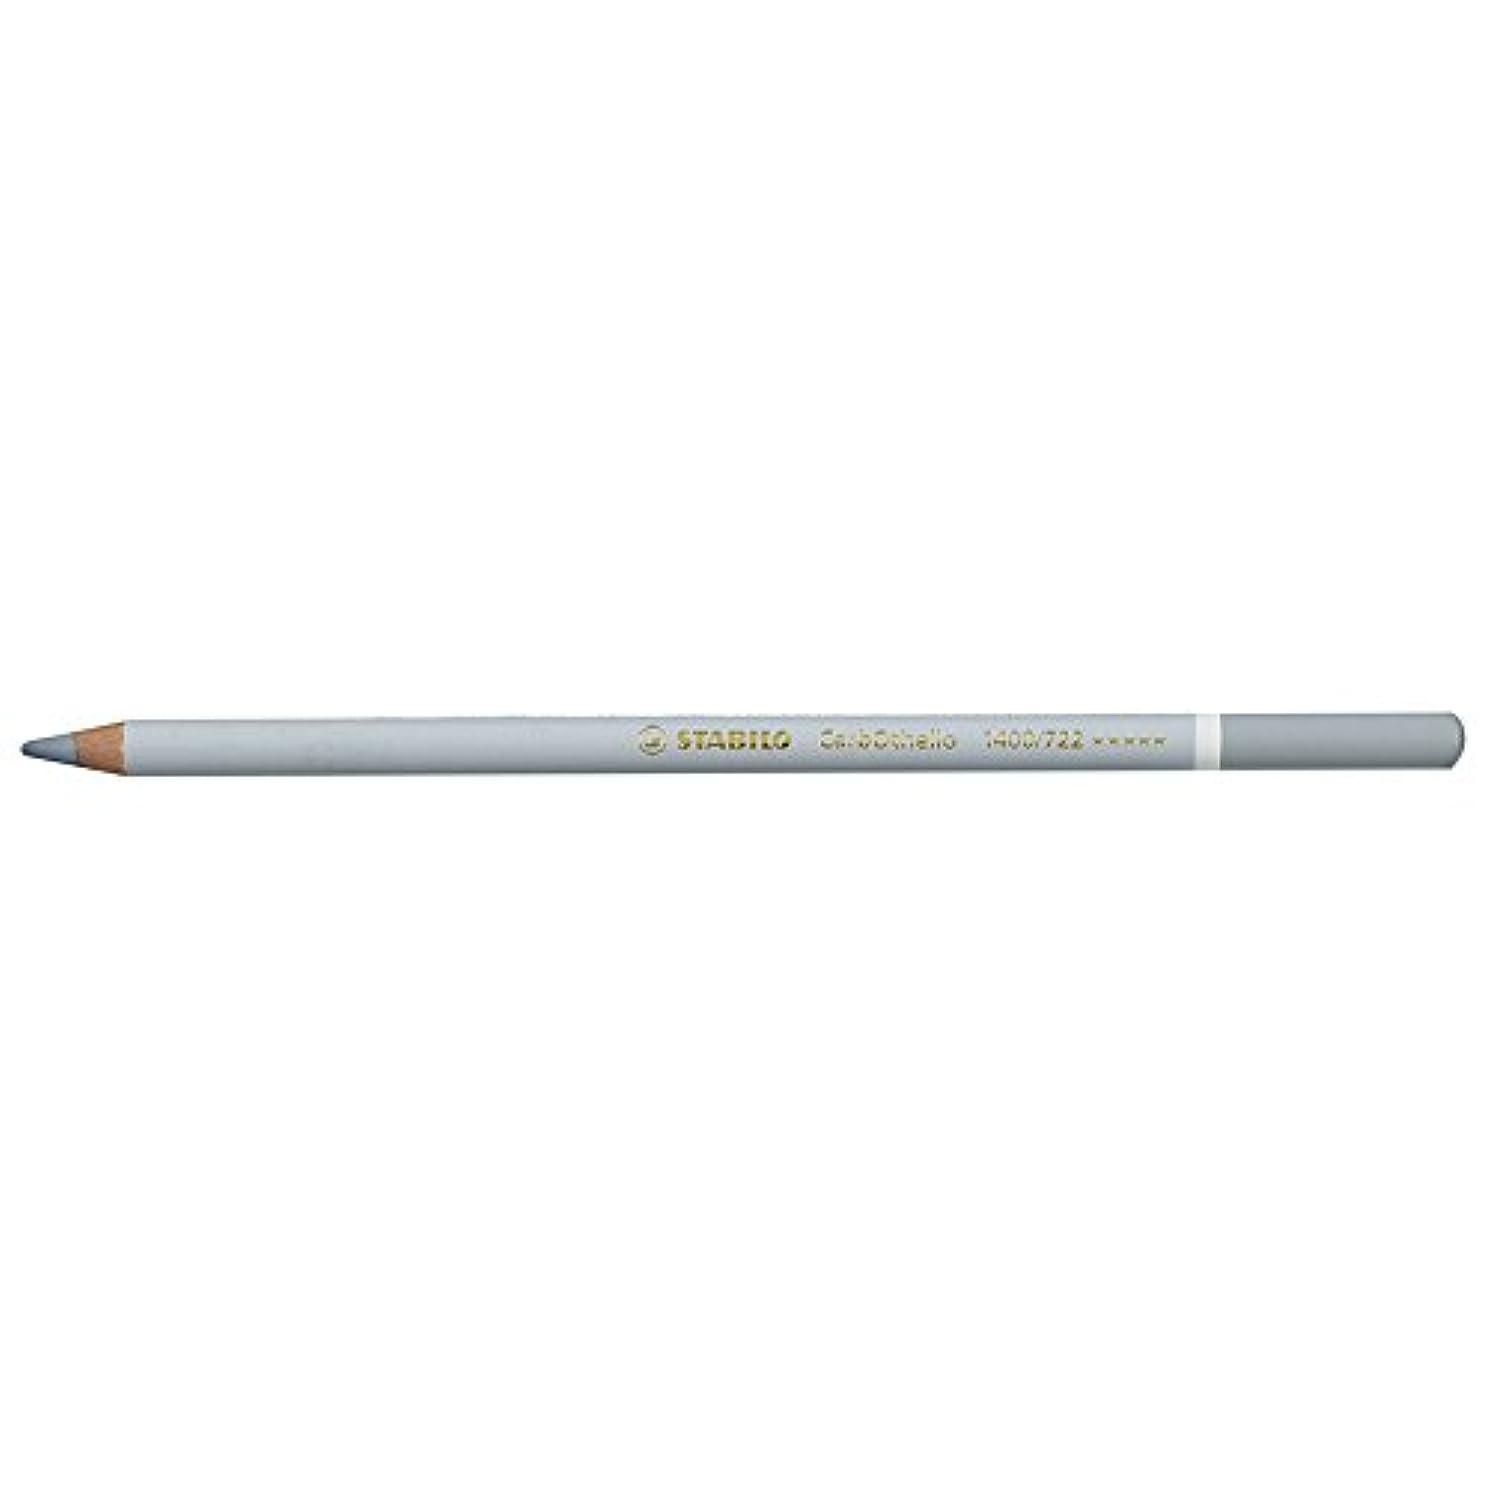 Stabilo CarbOthello Chalk-Pastel Colored Pencil, 4.4 mm - Grey 1